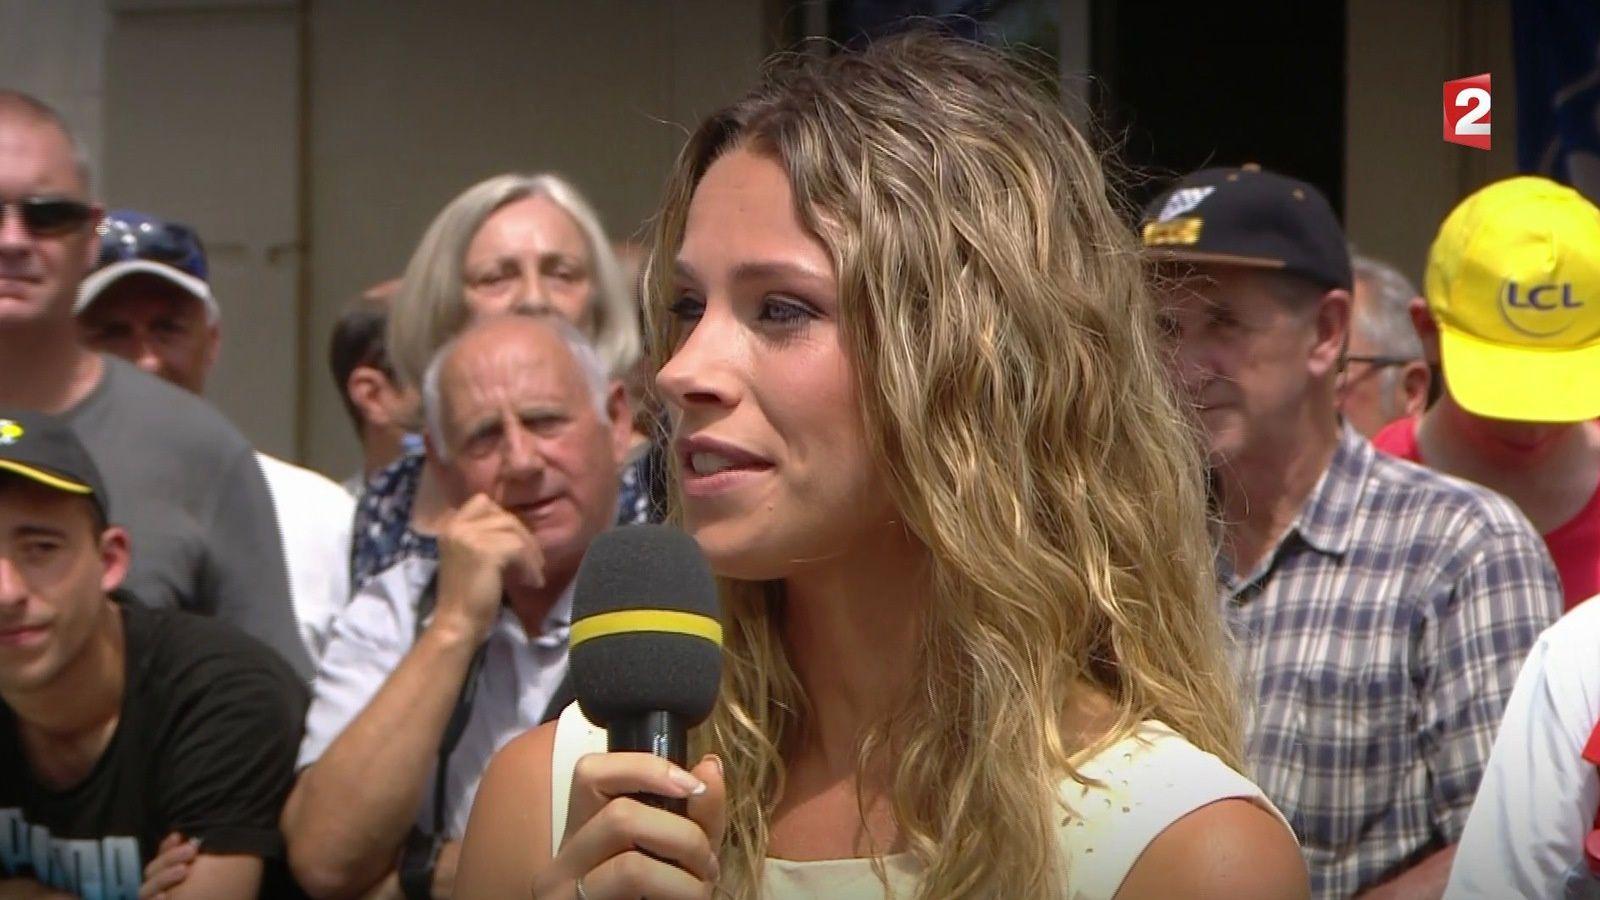 📸6 MARION ROUSSE @Roussemarion ce midi @france2tv 🚴 @Tourdefrance17 🚴 #vuesalatele #tourdefrance2017